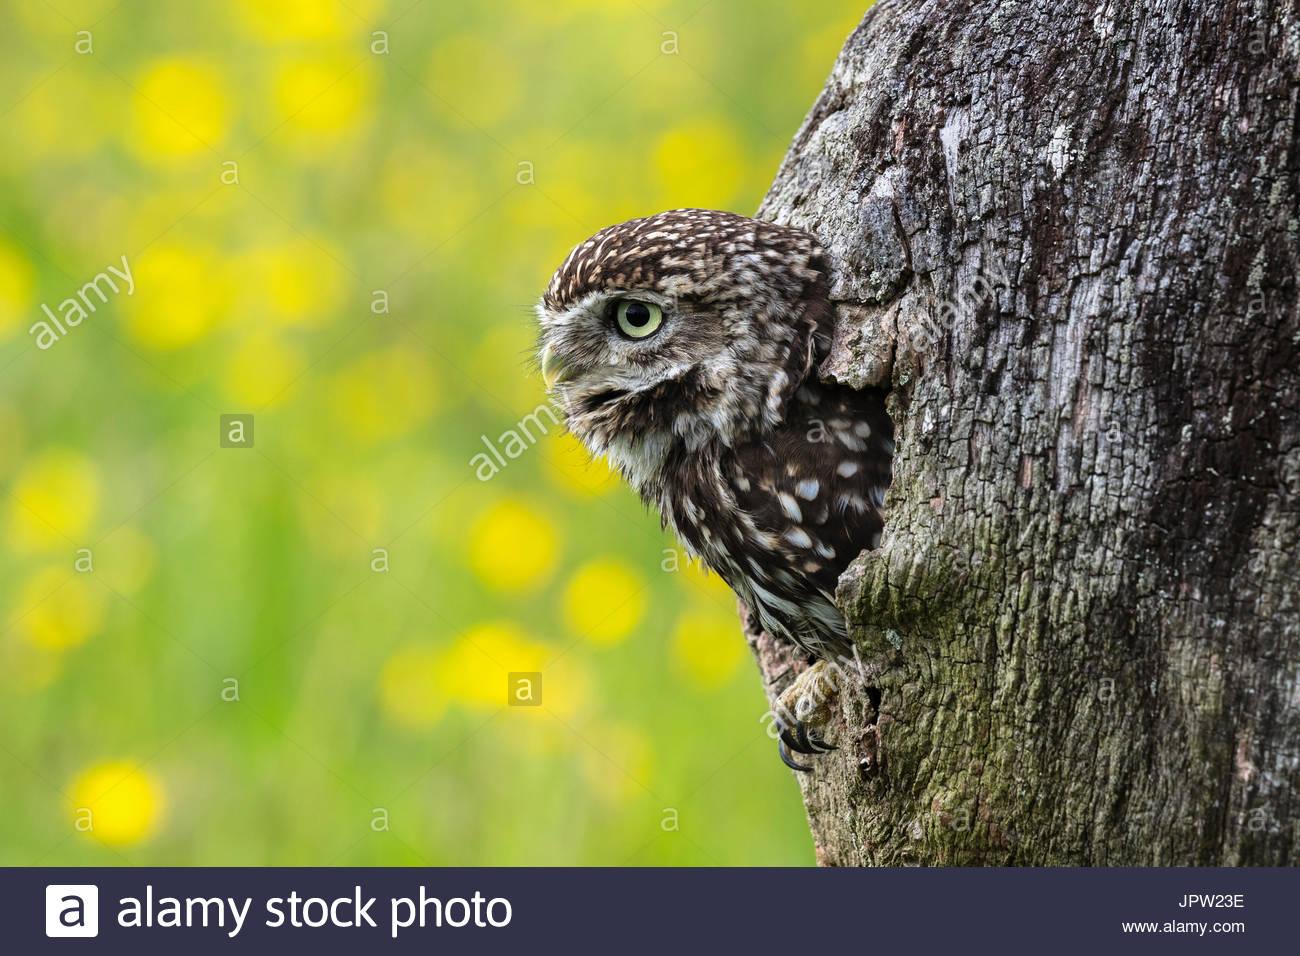 Little owl (Athene noctua), captive, Cumbria, UK - Stock Image